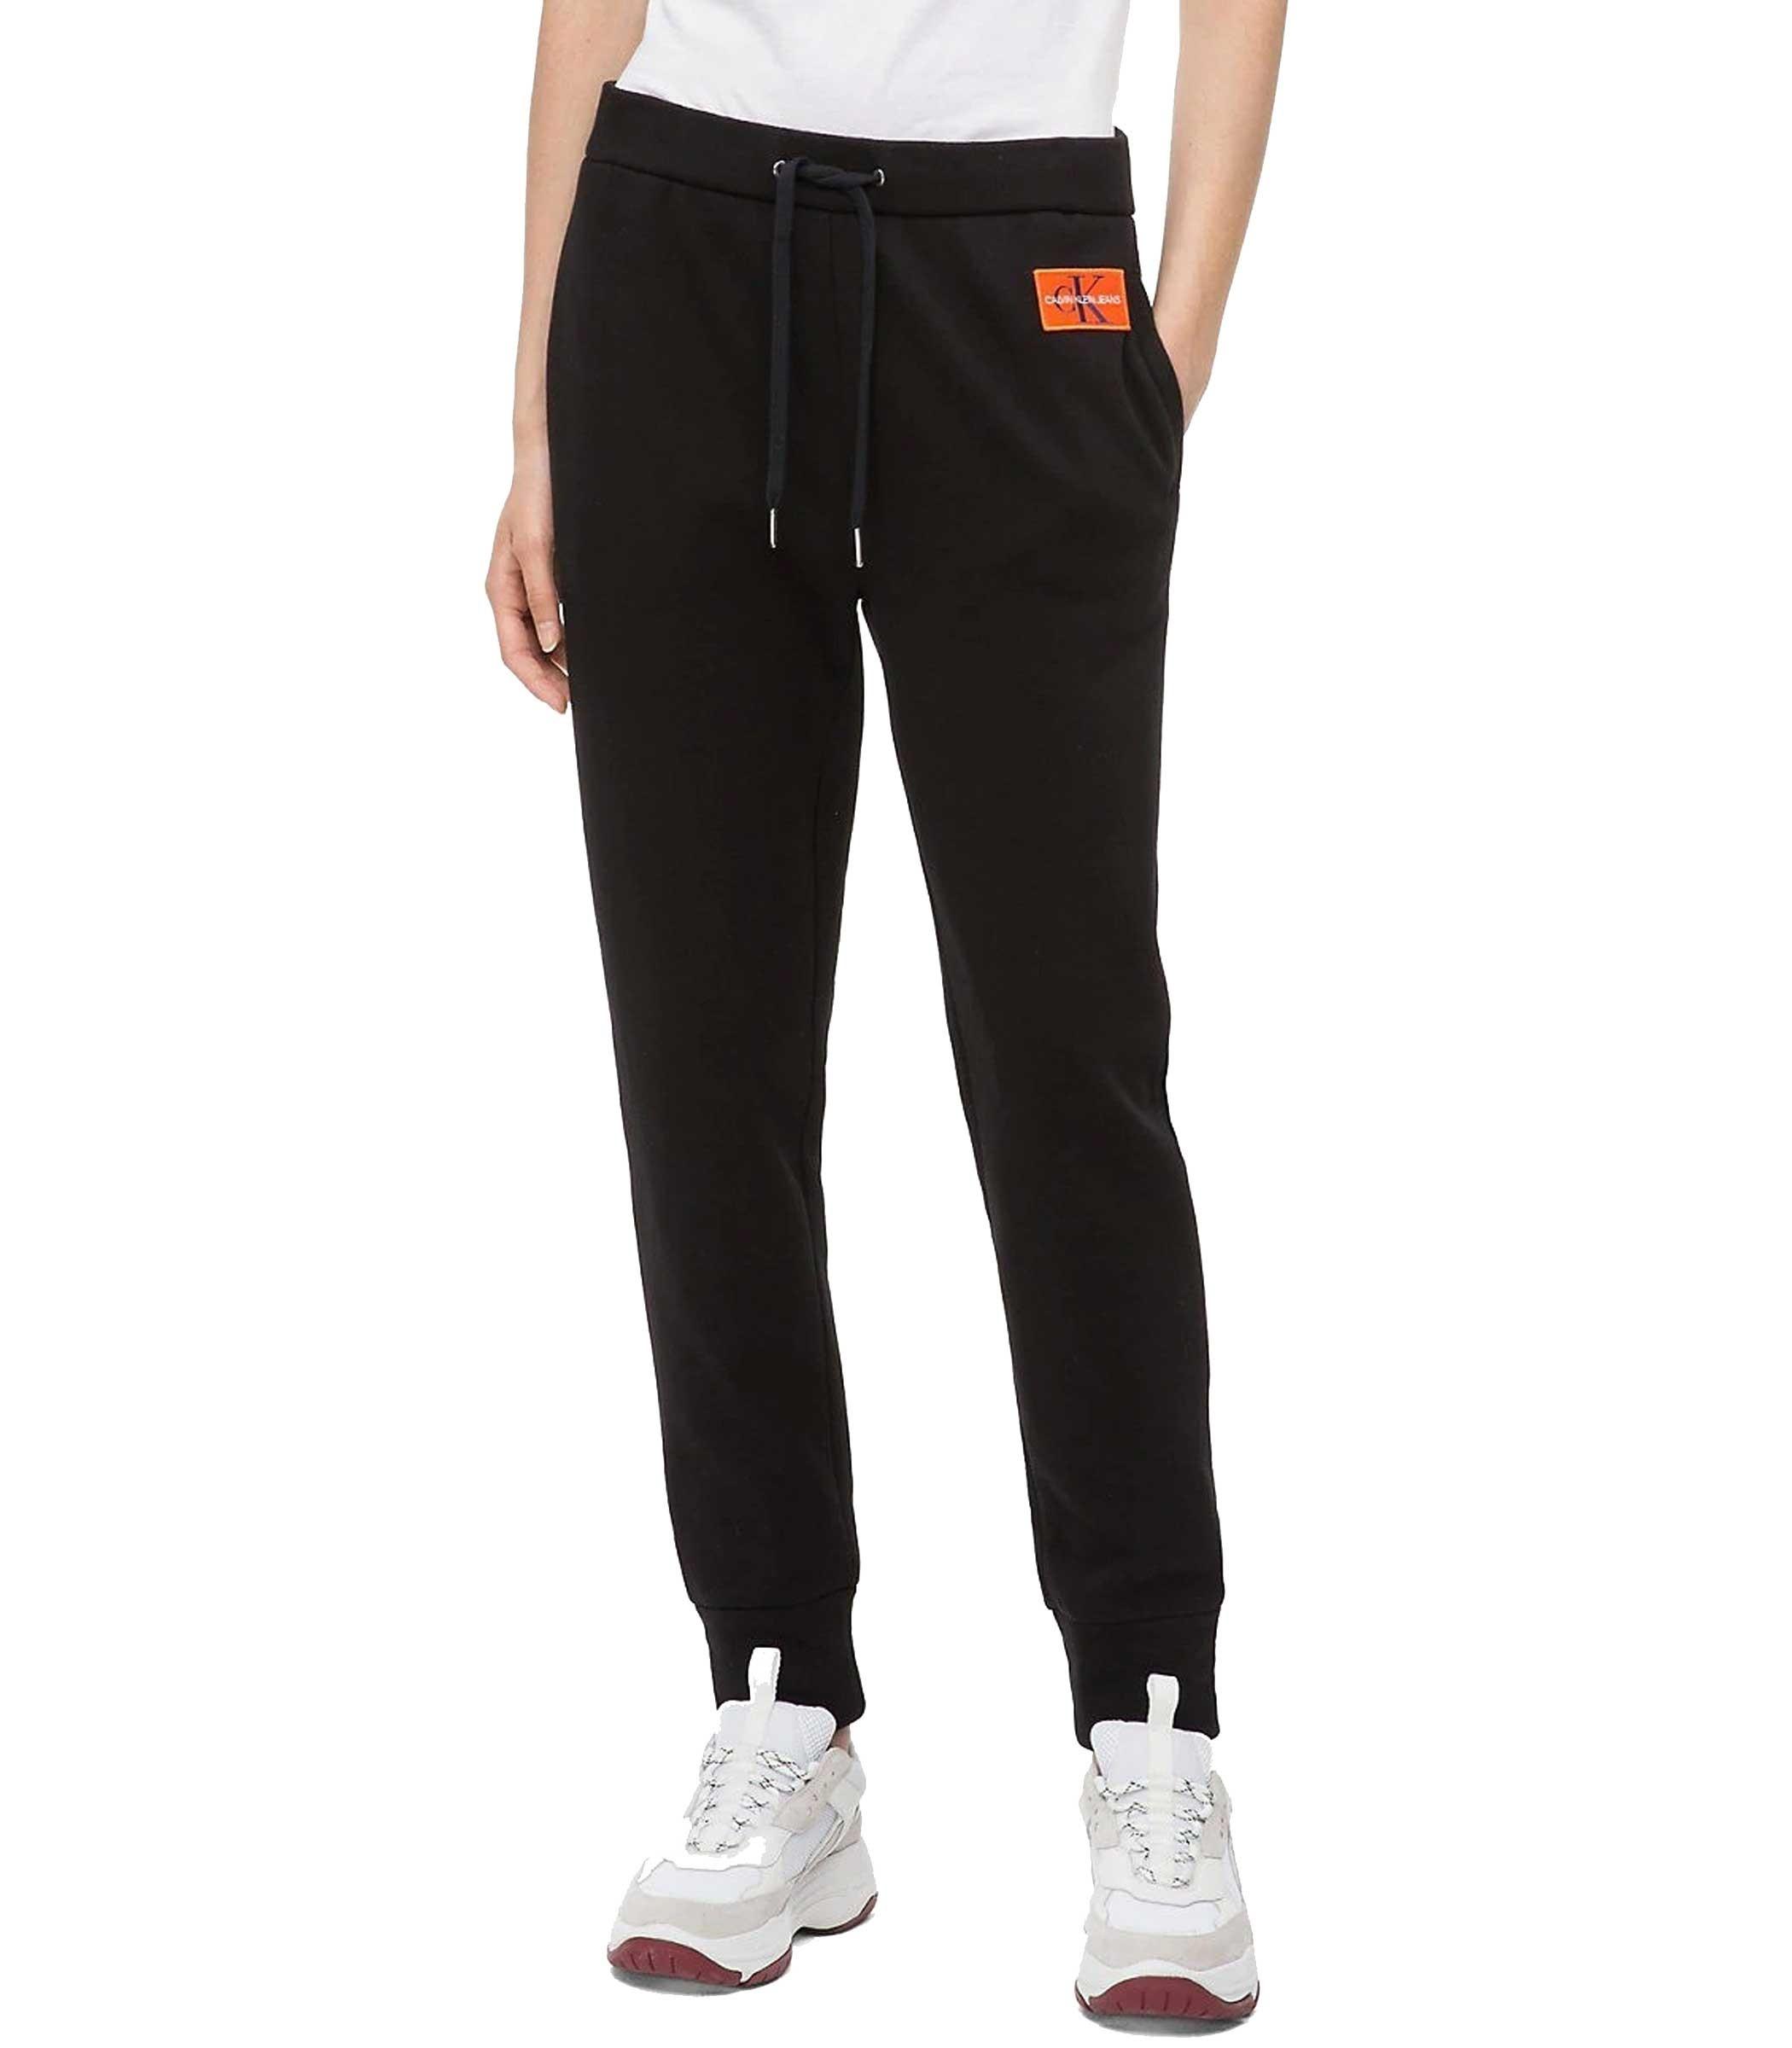 save off 4719d b08db Pantaloni tuta Calvin Klein Jeans da donna rif. J20J208567